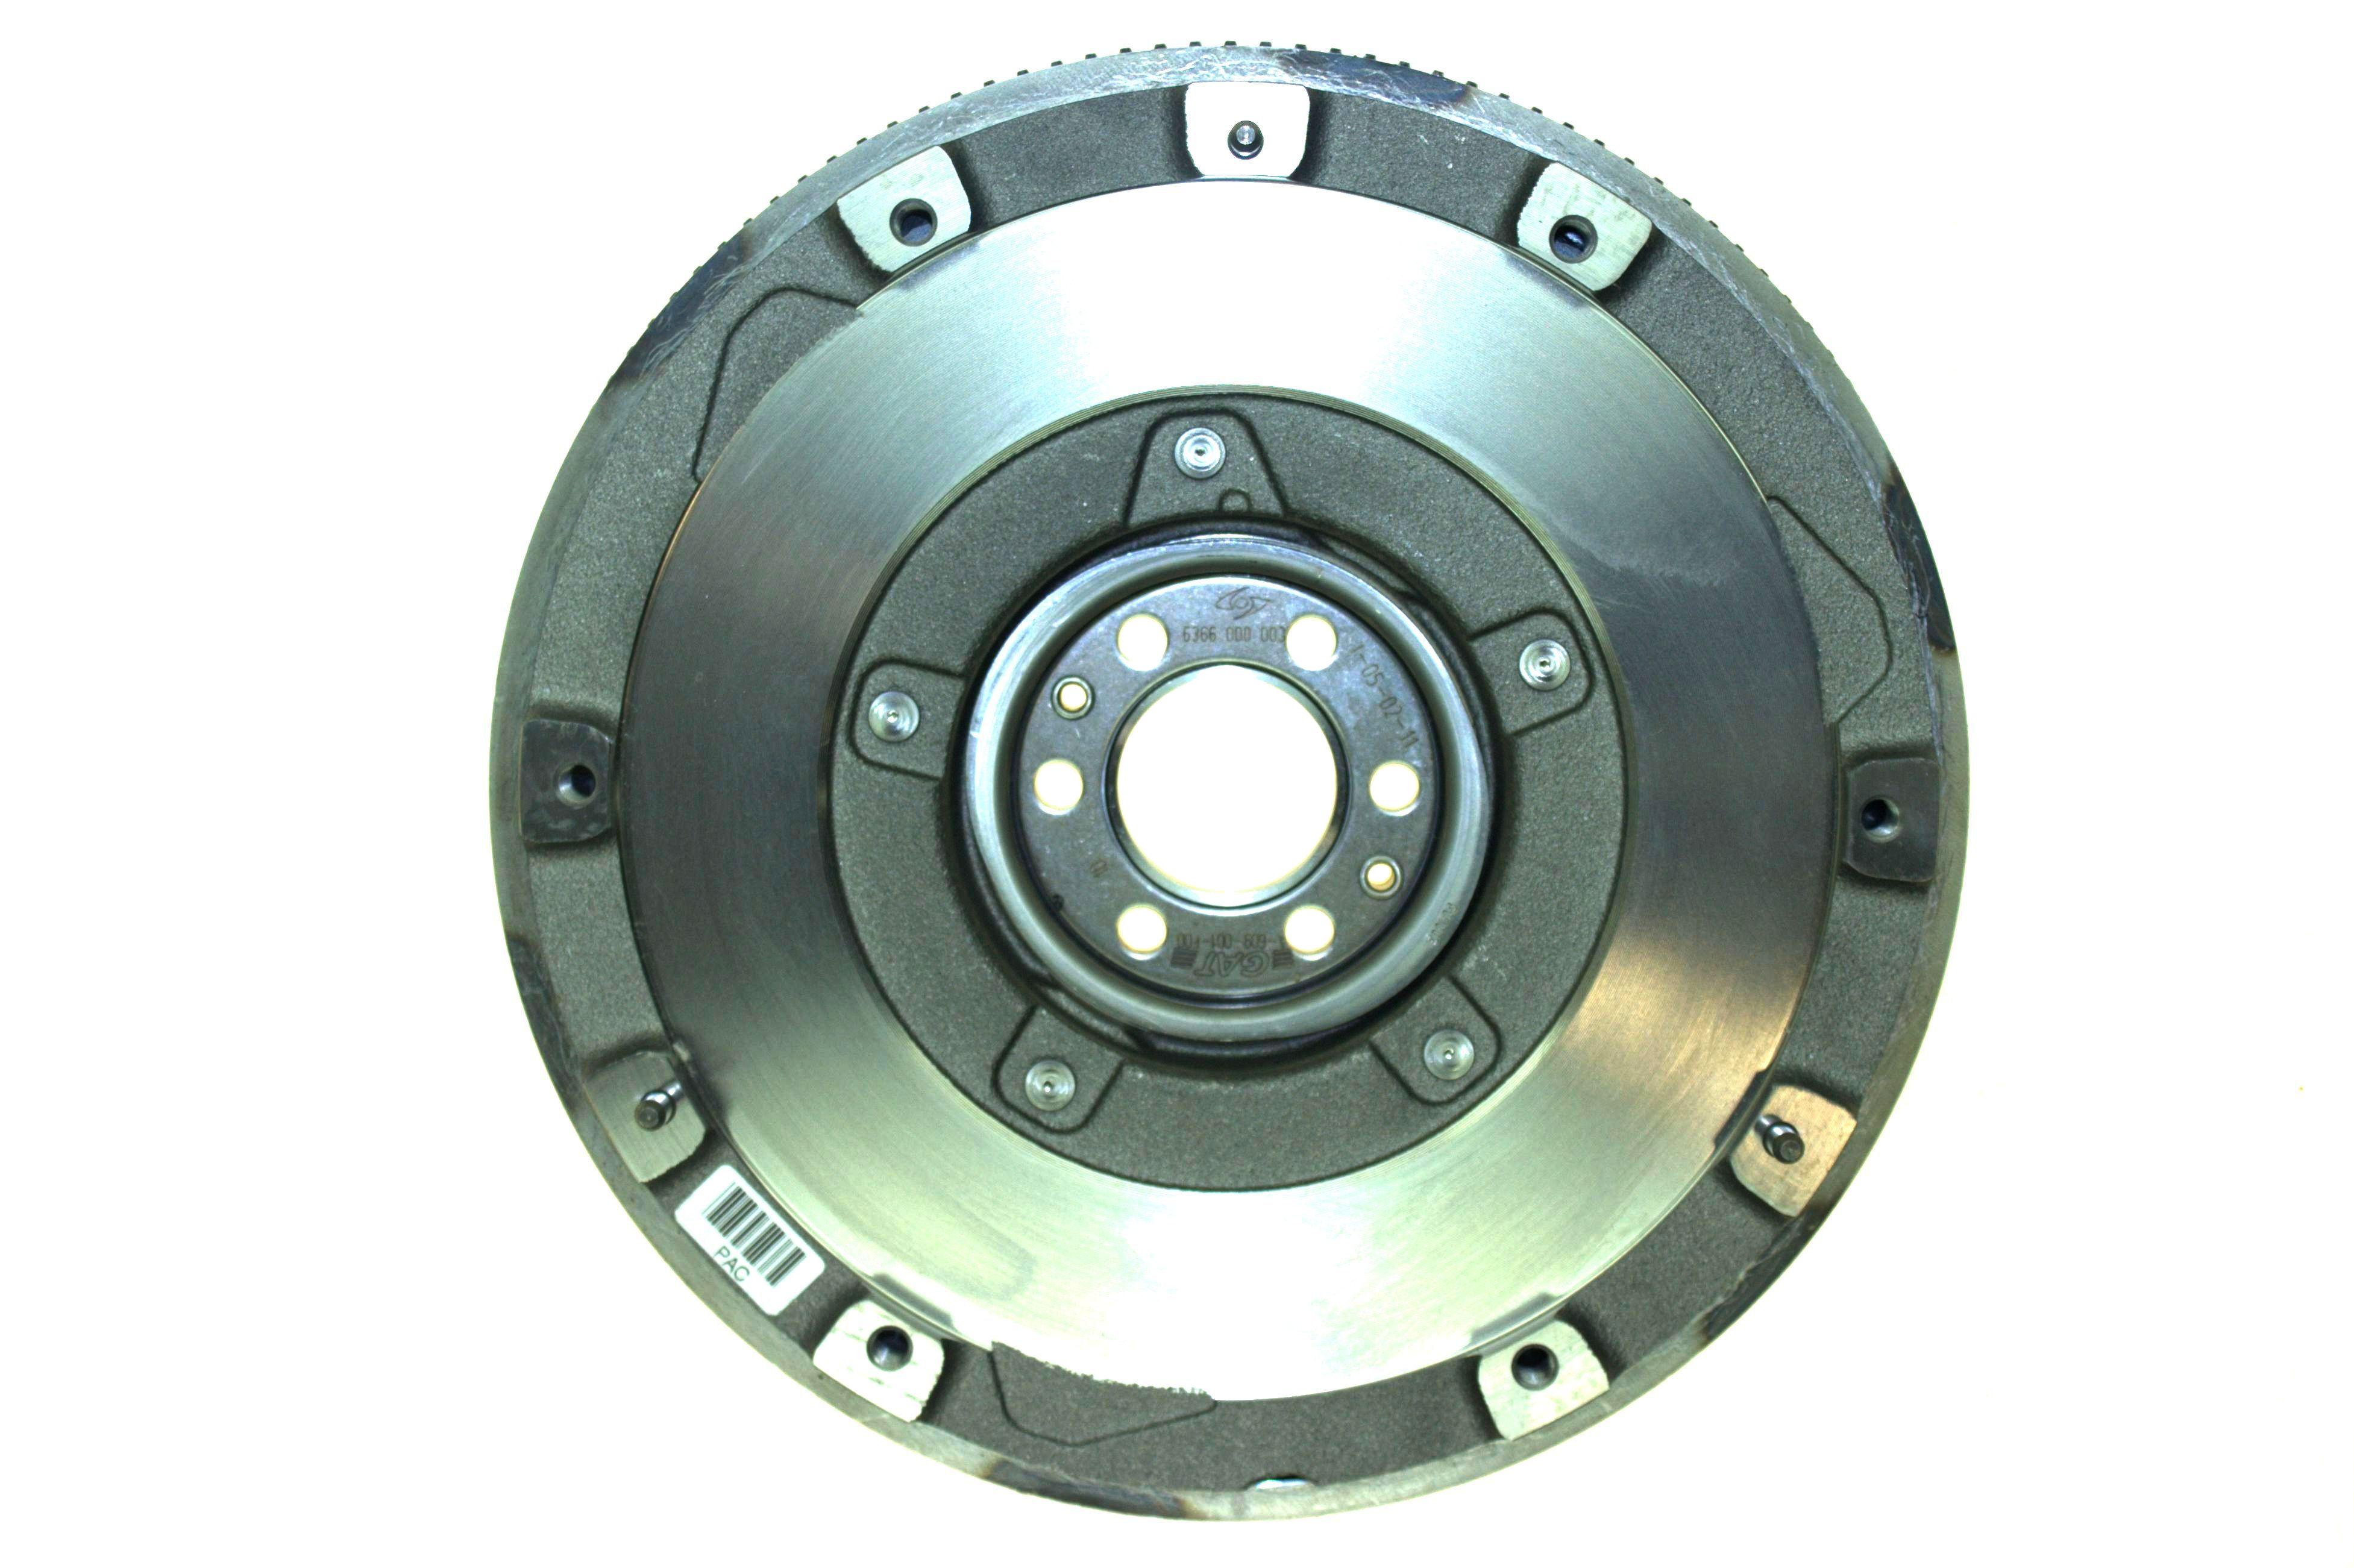 New Mini Cooper LuK Clutch Flywheel 4160288100 11227561765